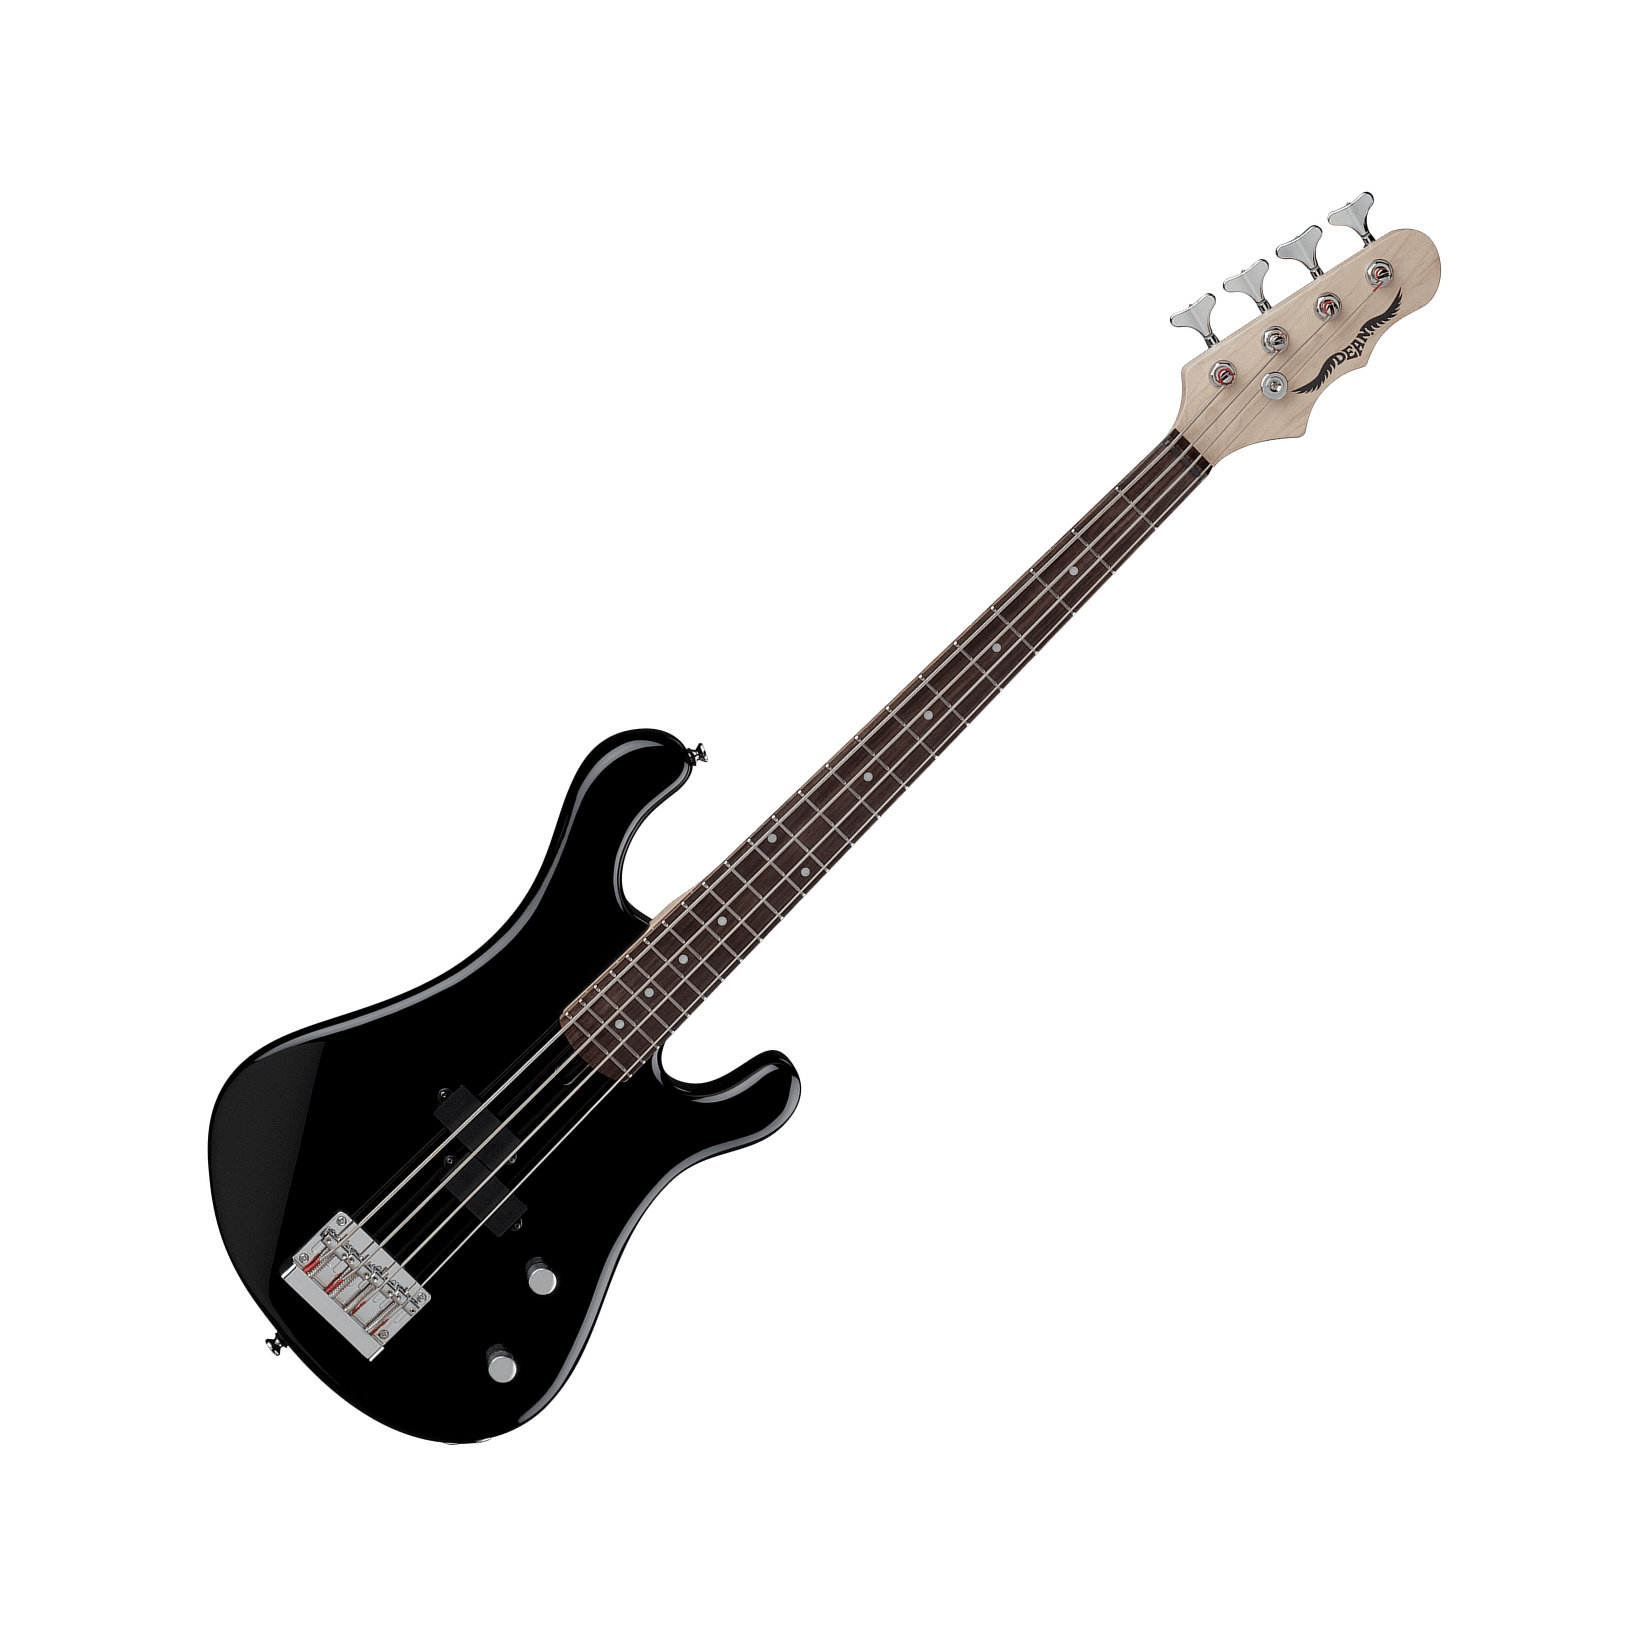 Dean hillsboro junior classic black house of bass for Classic house bass lines